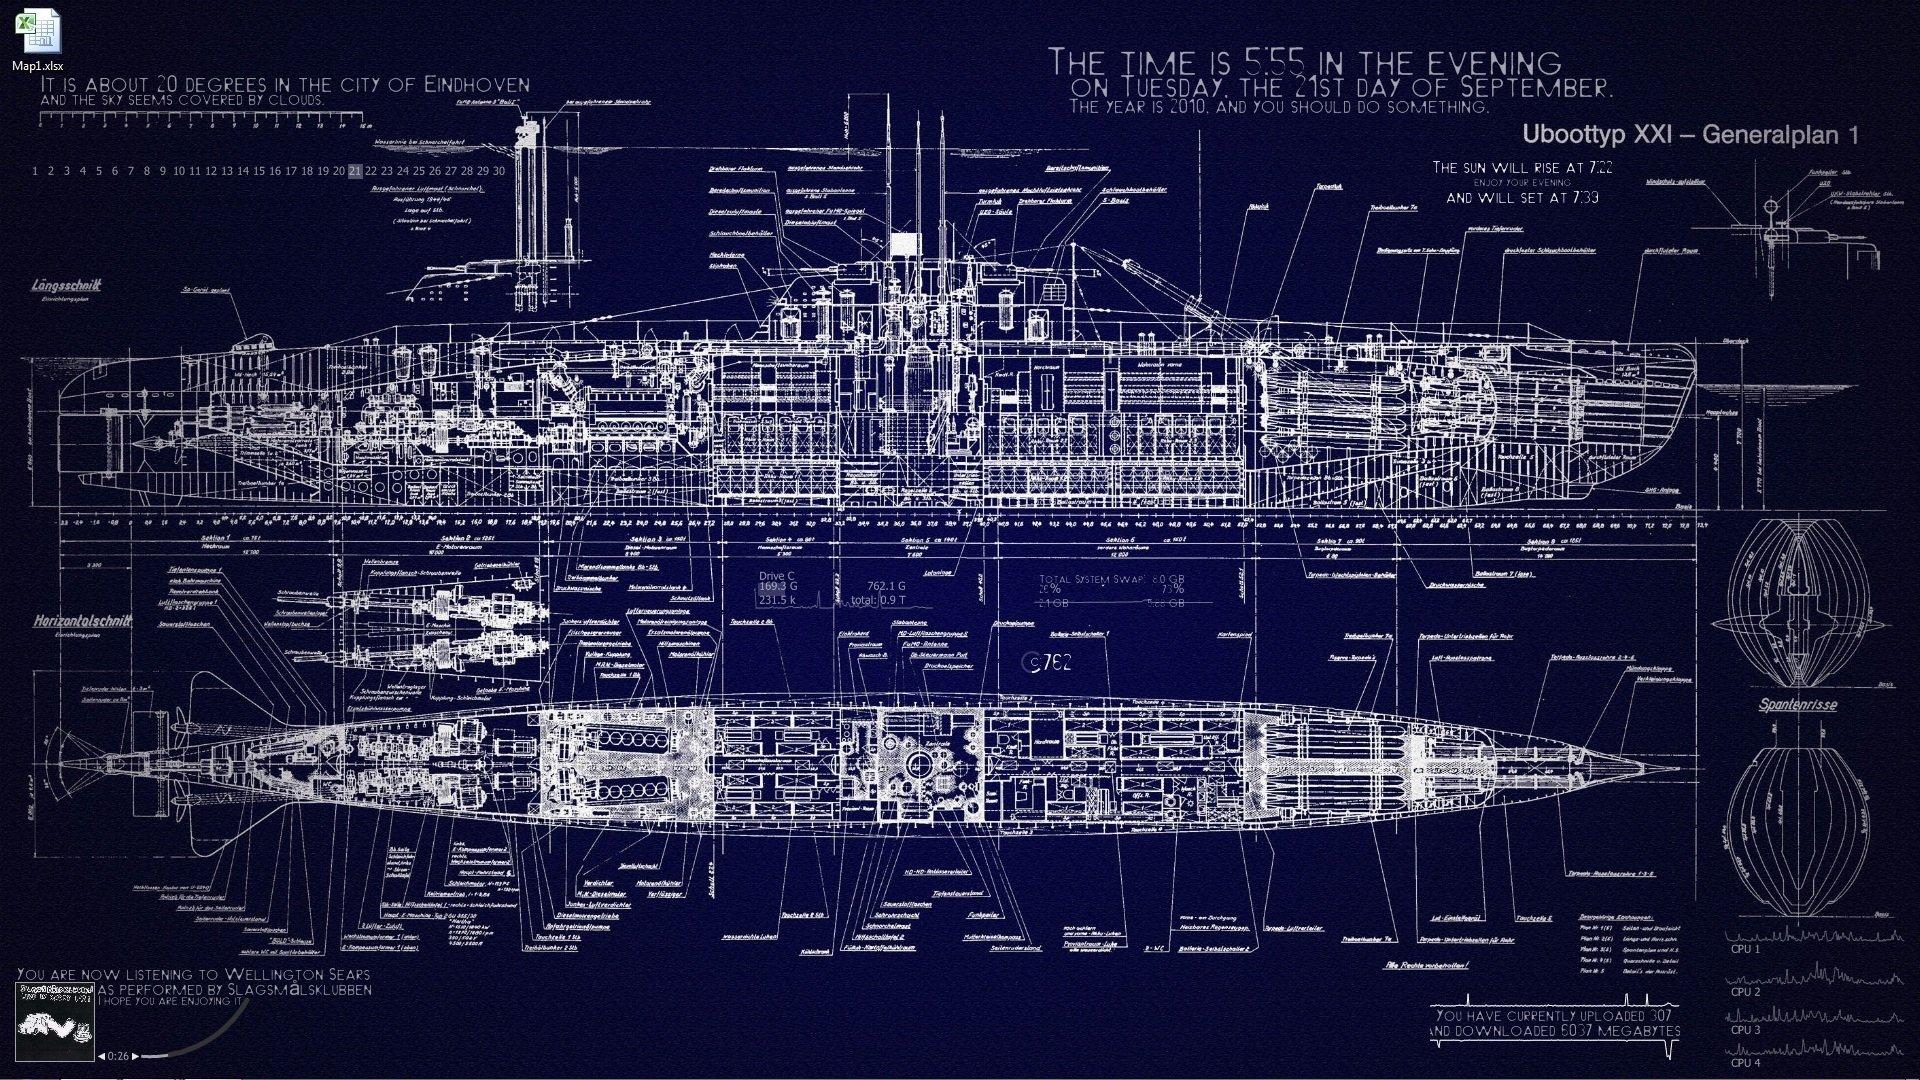 SUBMARINE ship boat military navy wallpaper 1920x1080 410478 1920x1080